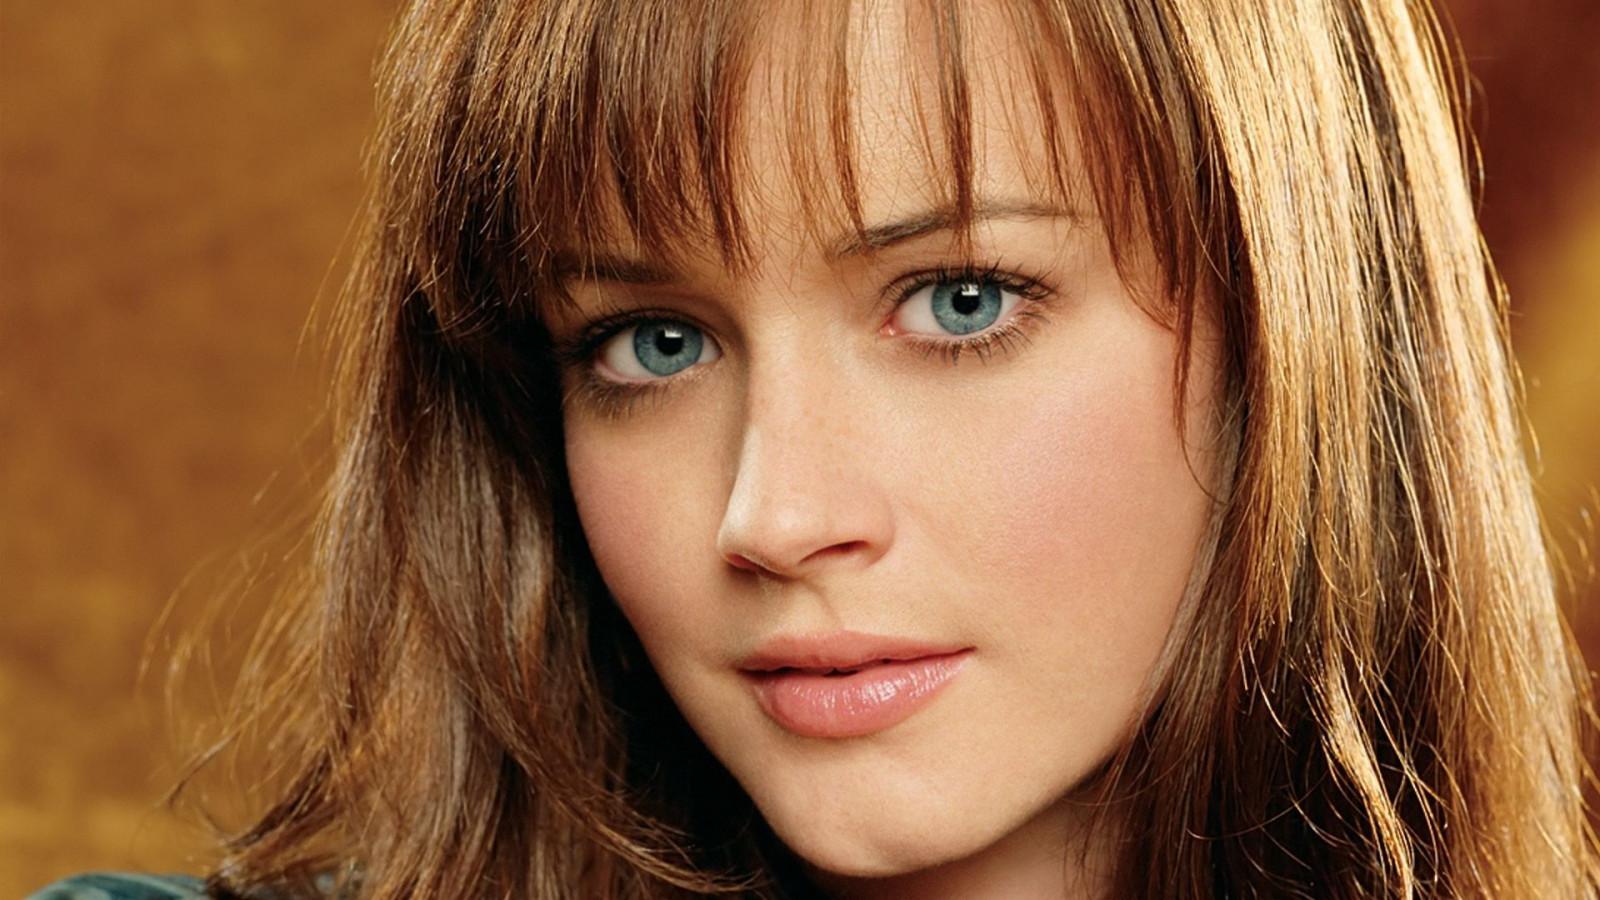 Who's your celebrity look alike? - Quiz - Quotev